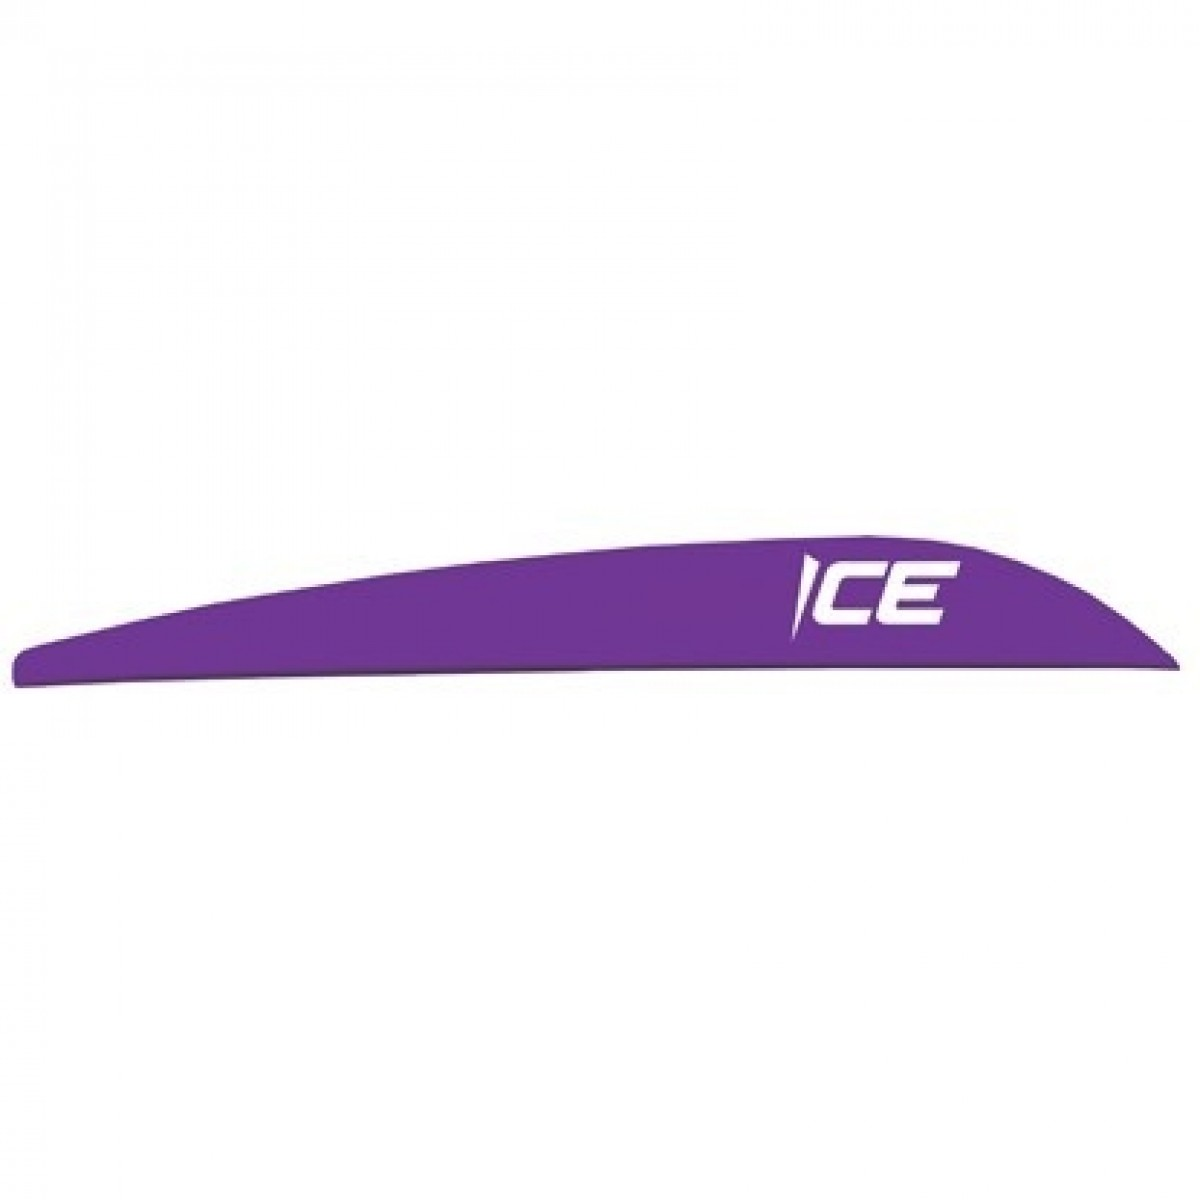 "Перо Bohning Ice 3"" (12 штук)"